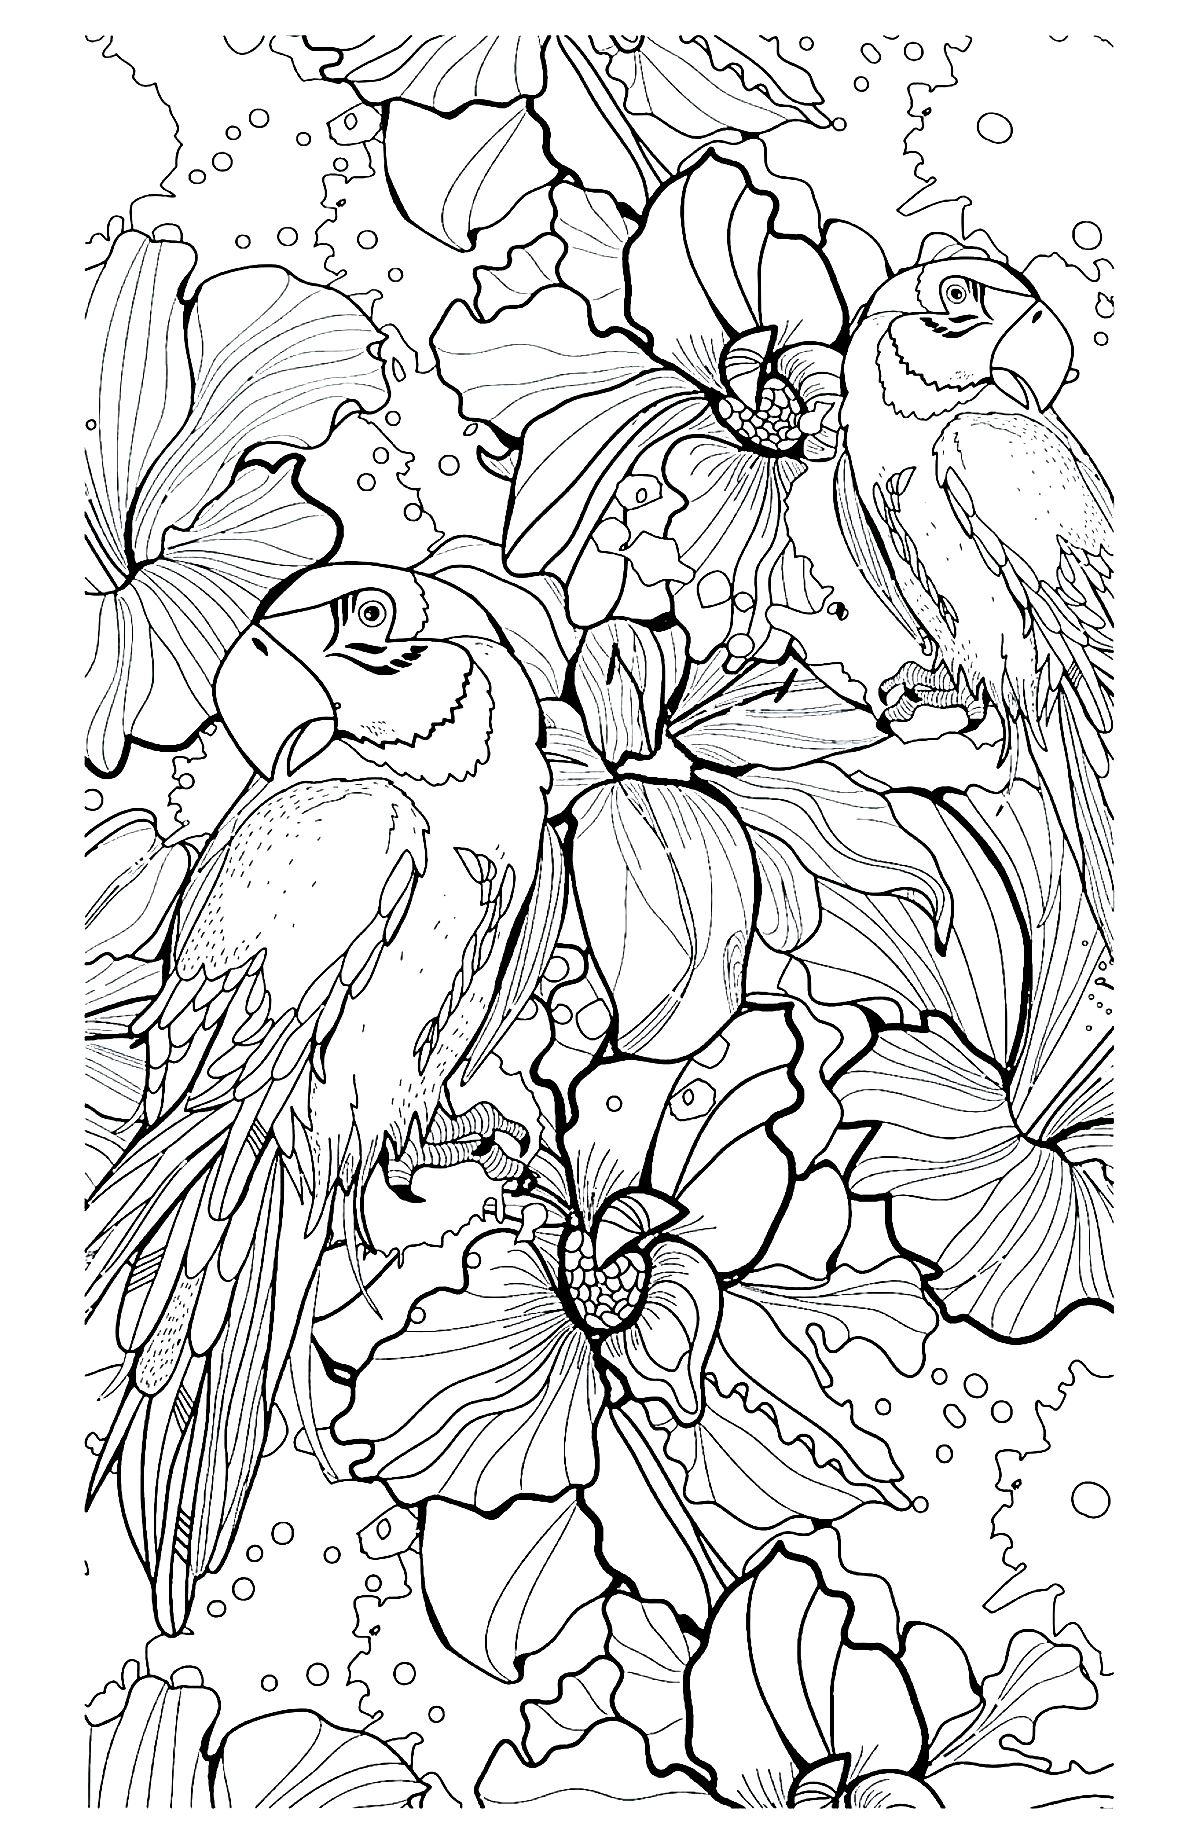 Complex coloring page of parrots